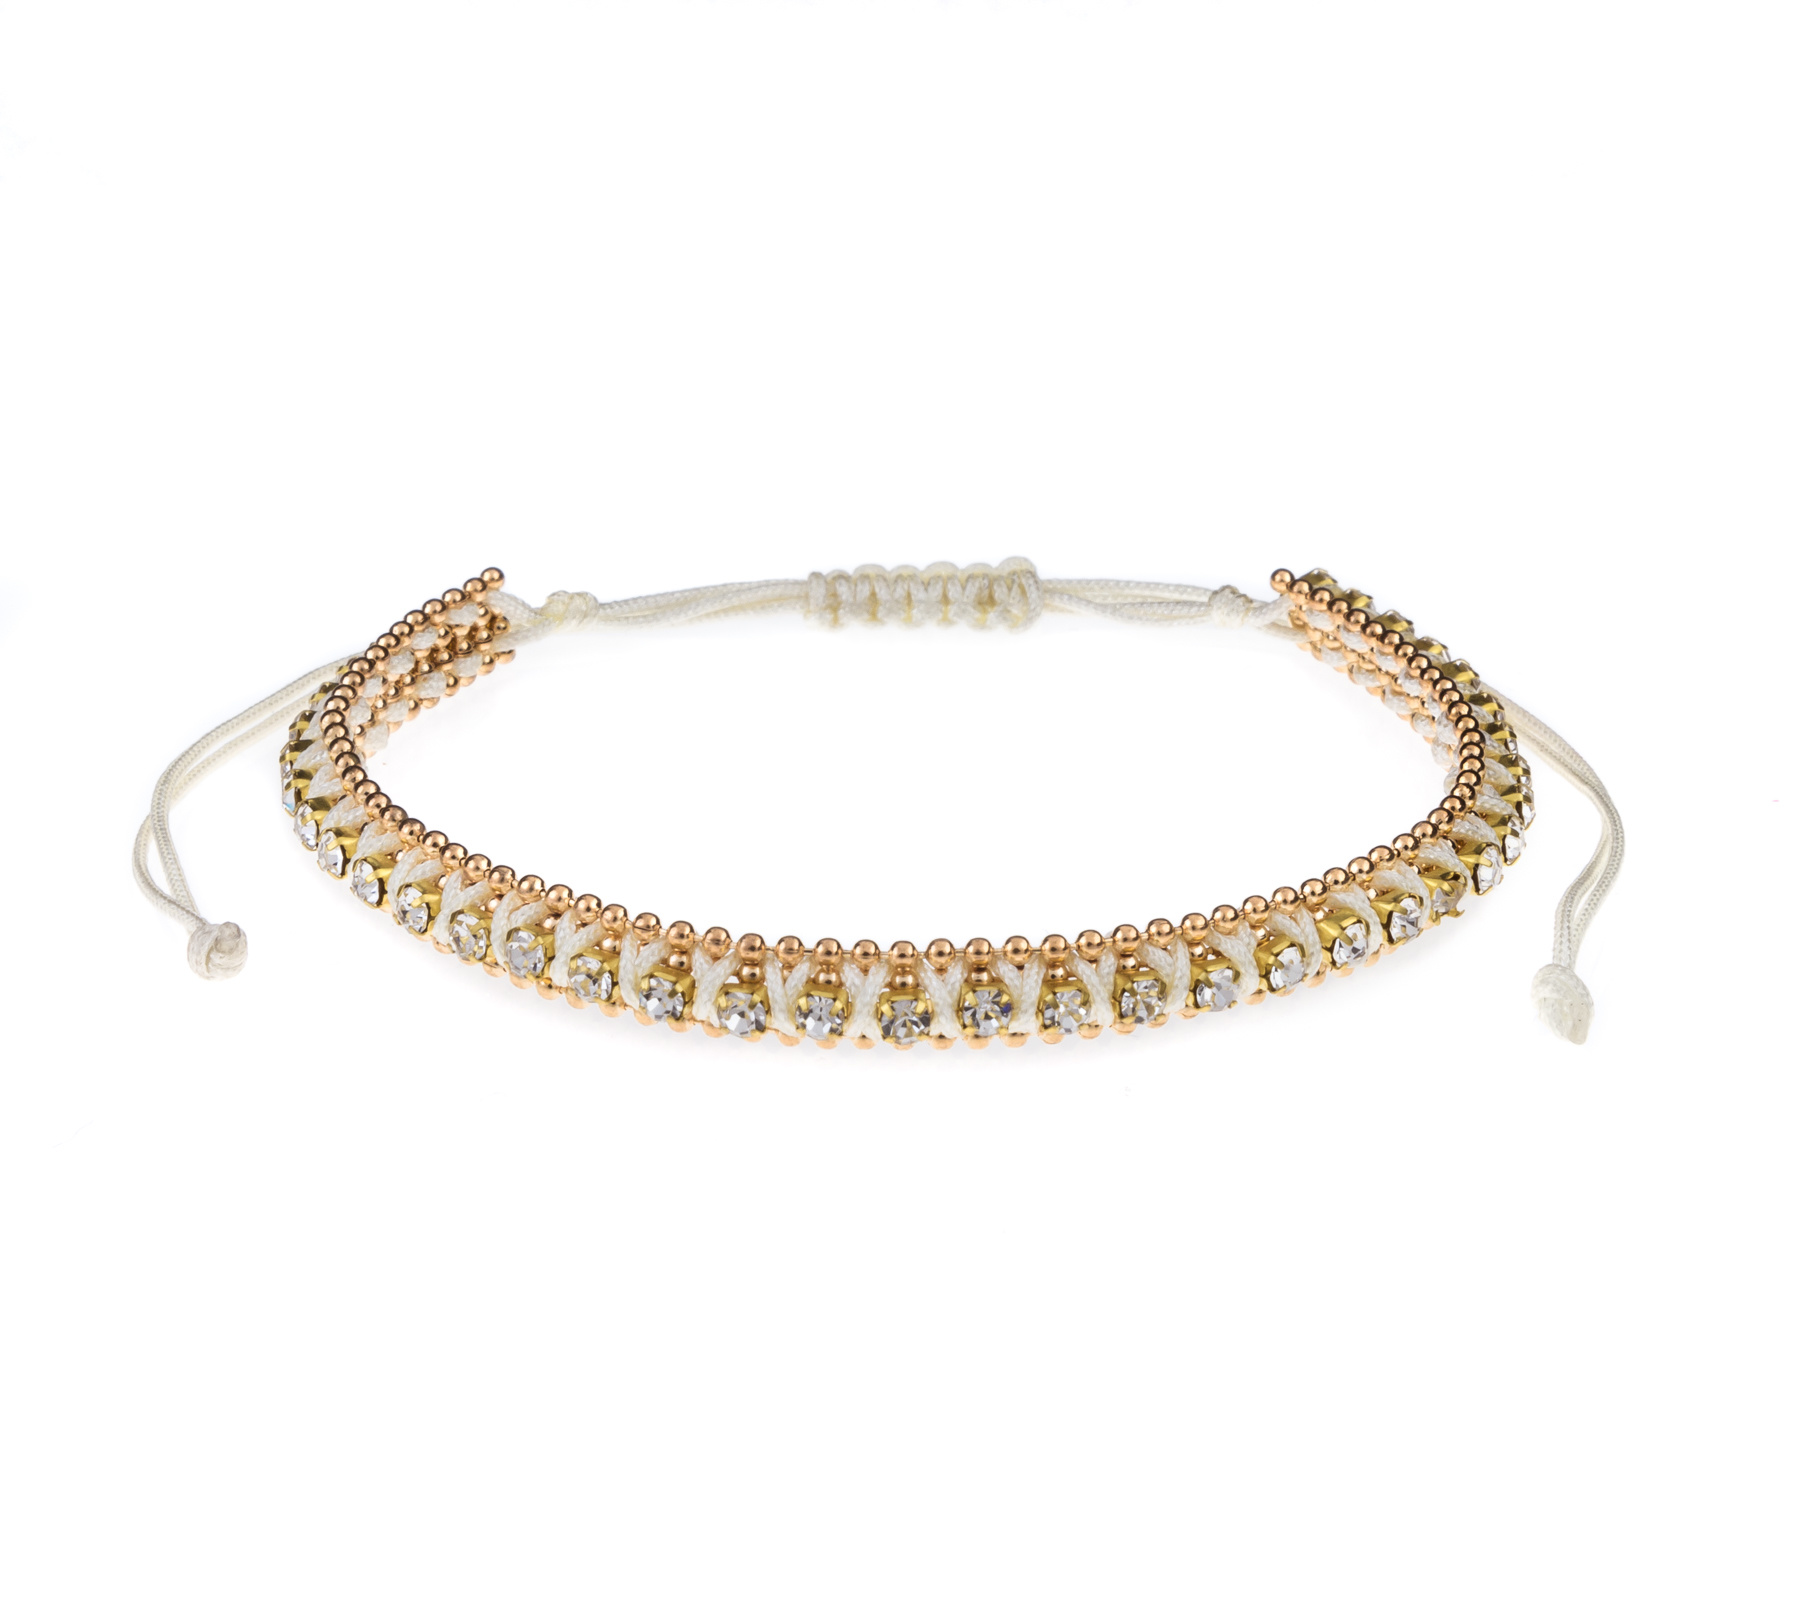 Armband met strass steentjes-3